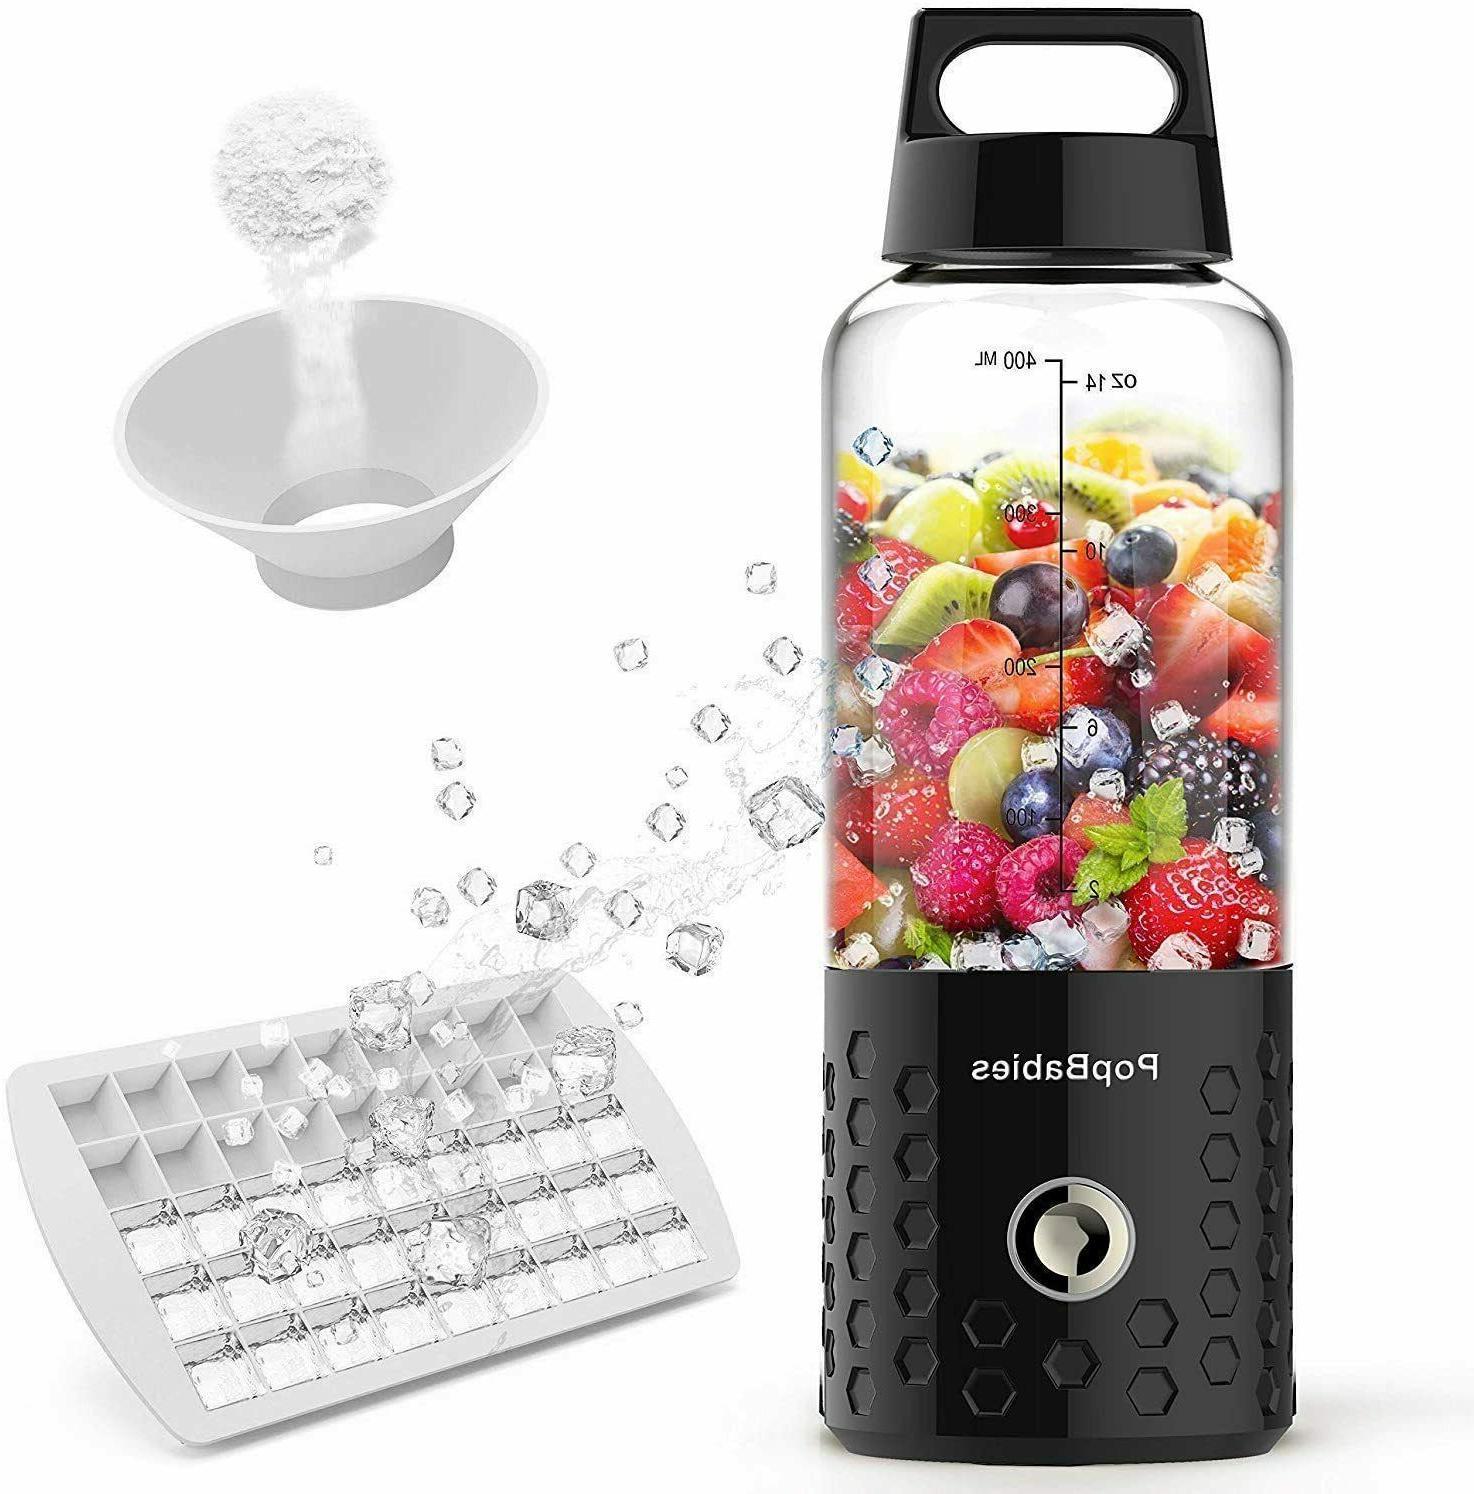 Portable Blender, Personal Blender, Smoothie Blender. Rechar